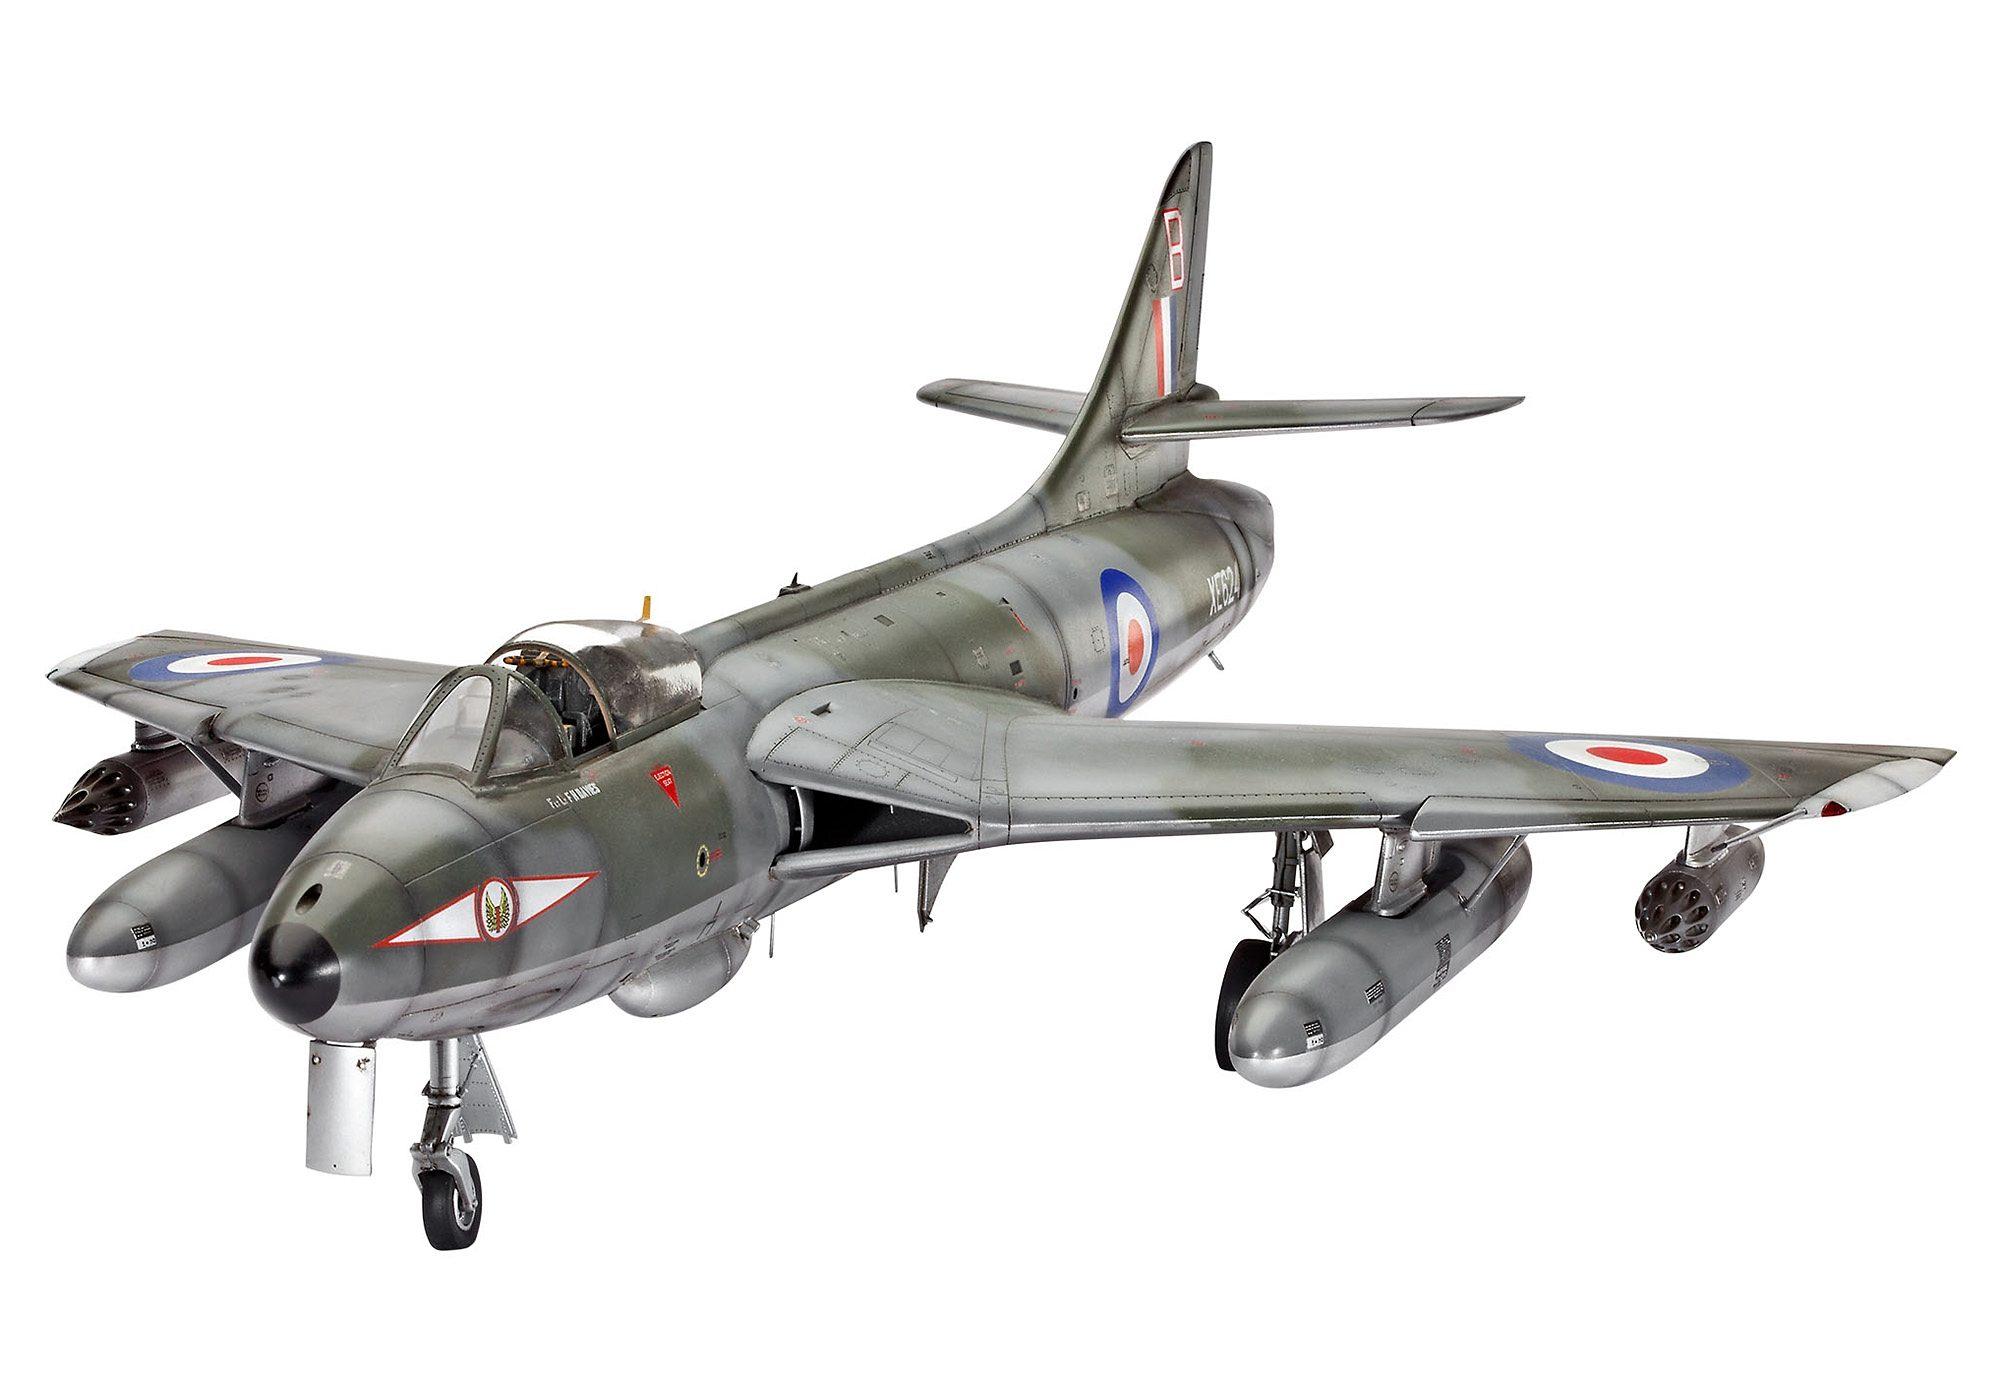 Revell® Modellbausatz Flugzeug, »Hawker Hunter FGA.9/Mk.58«, 1:32